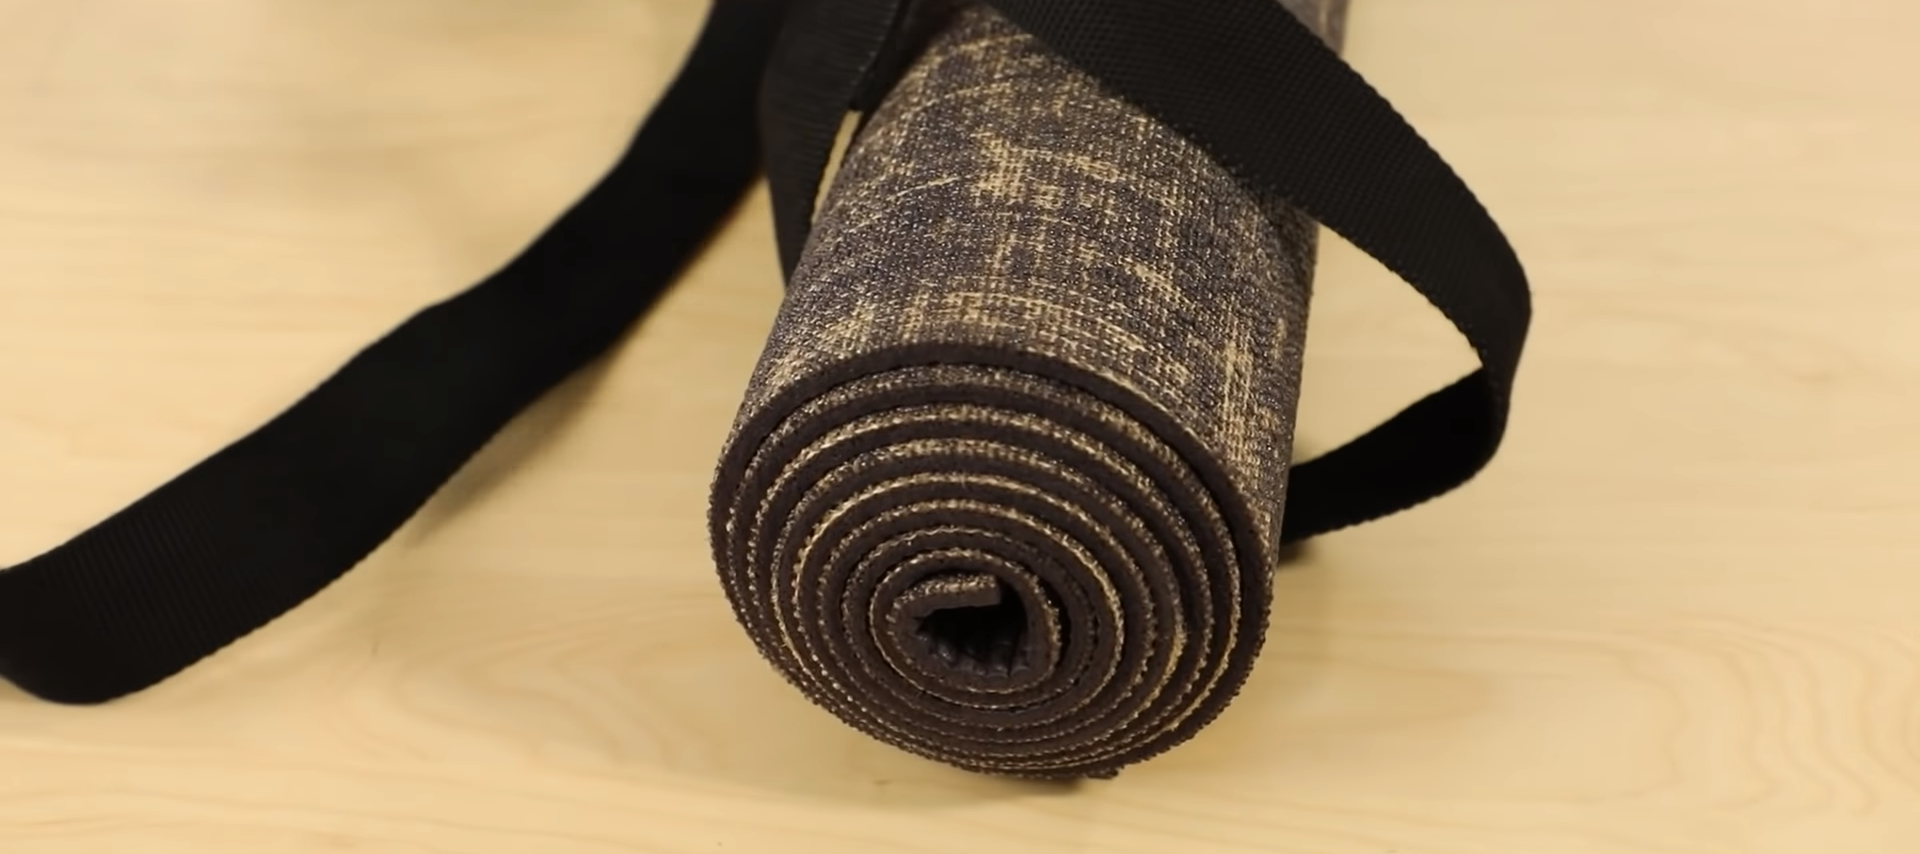 Review of Best Jute Yoga Mats